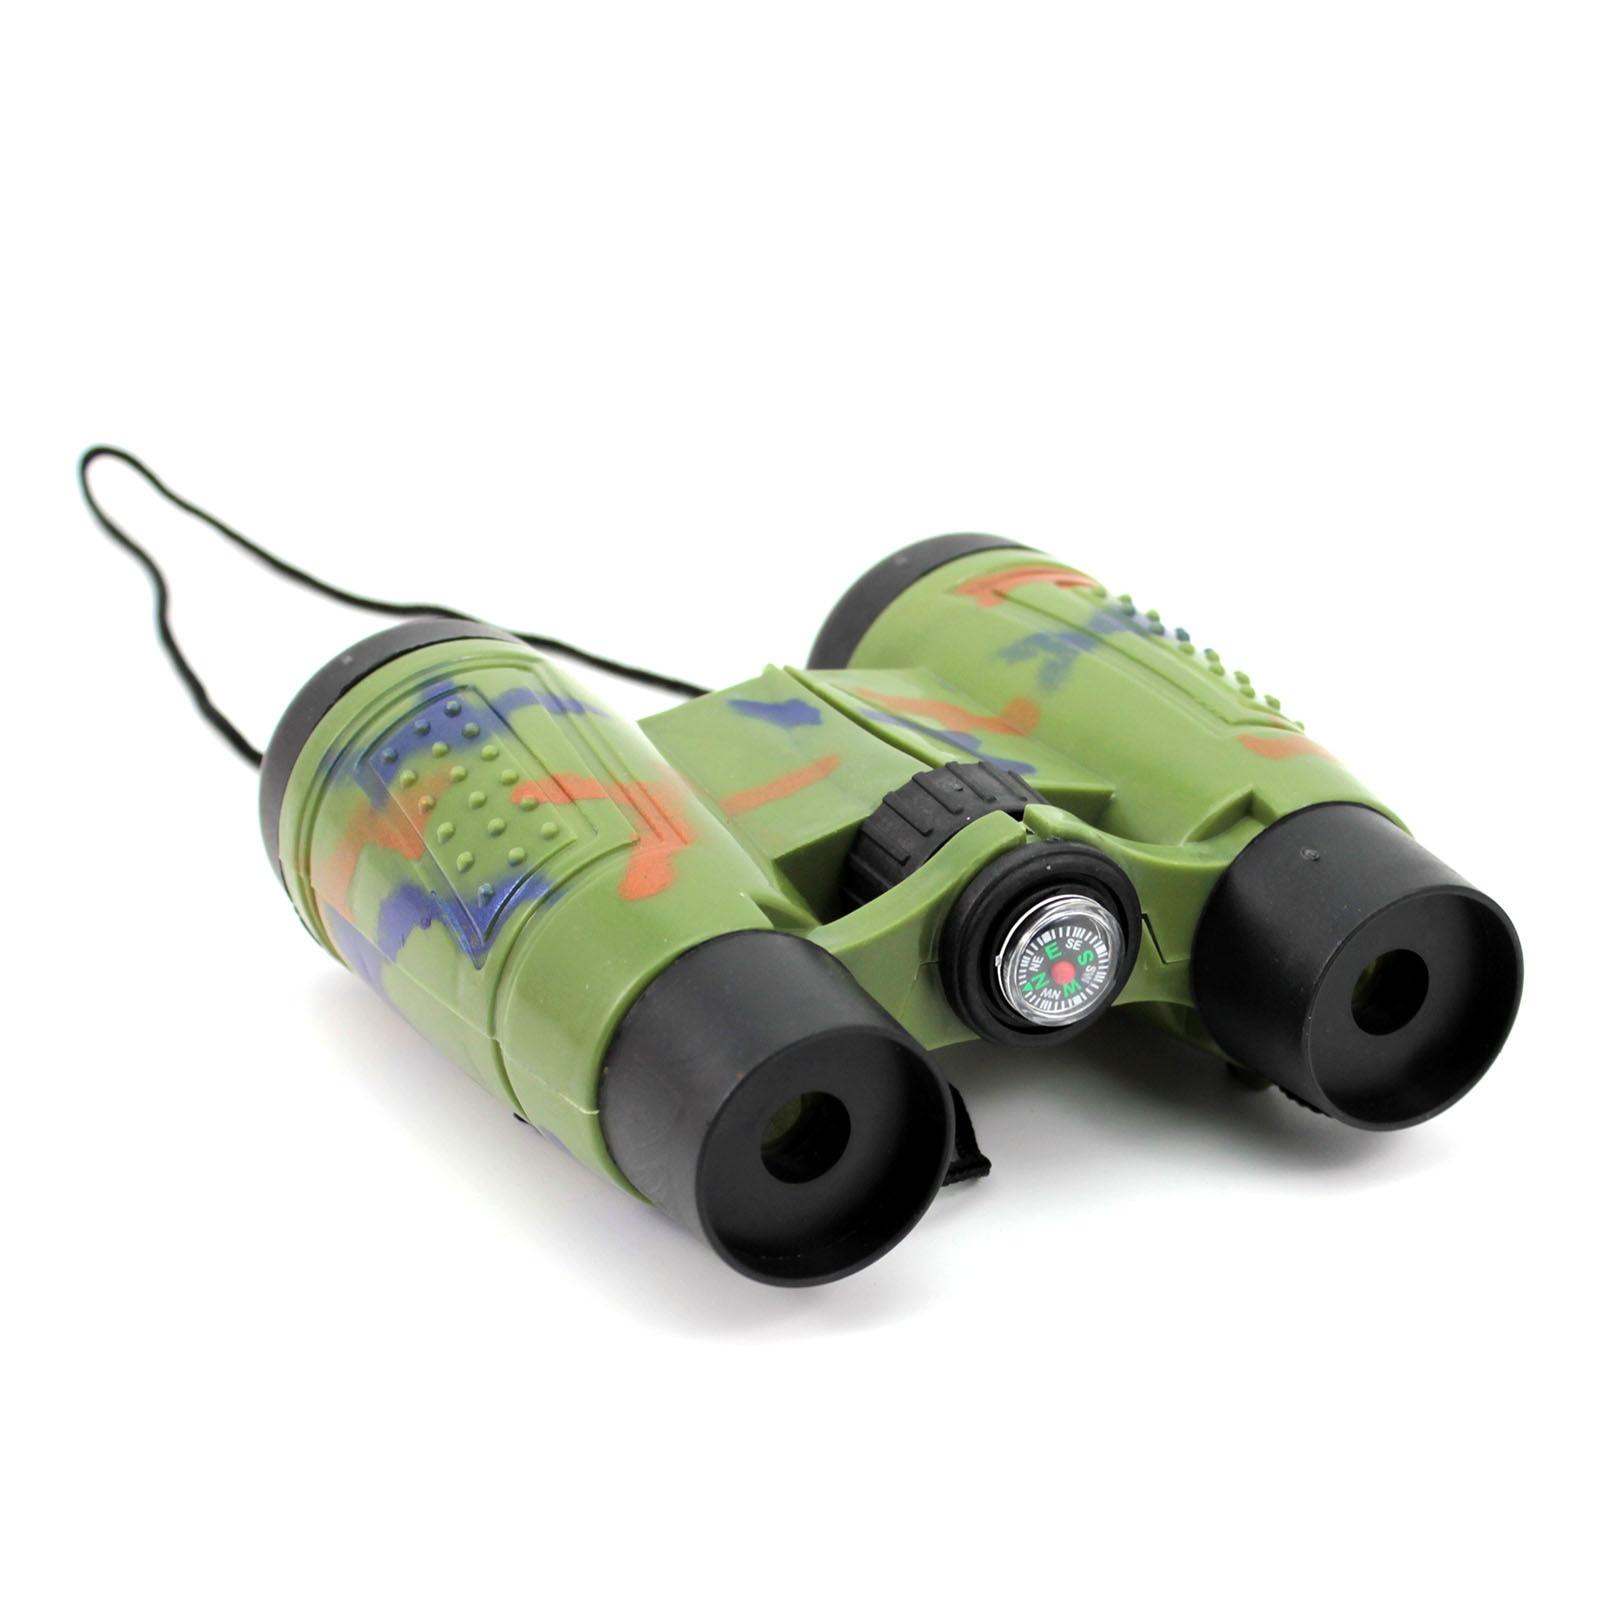 2016 Science Toys Telescope Camouflage Kid Toy Binocular Telescope Beach Camp Children Toys Magnification 4X